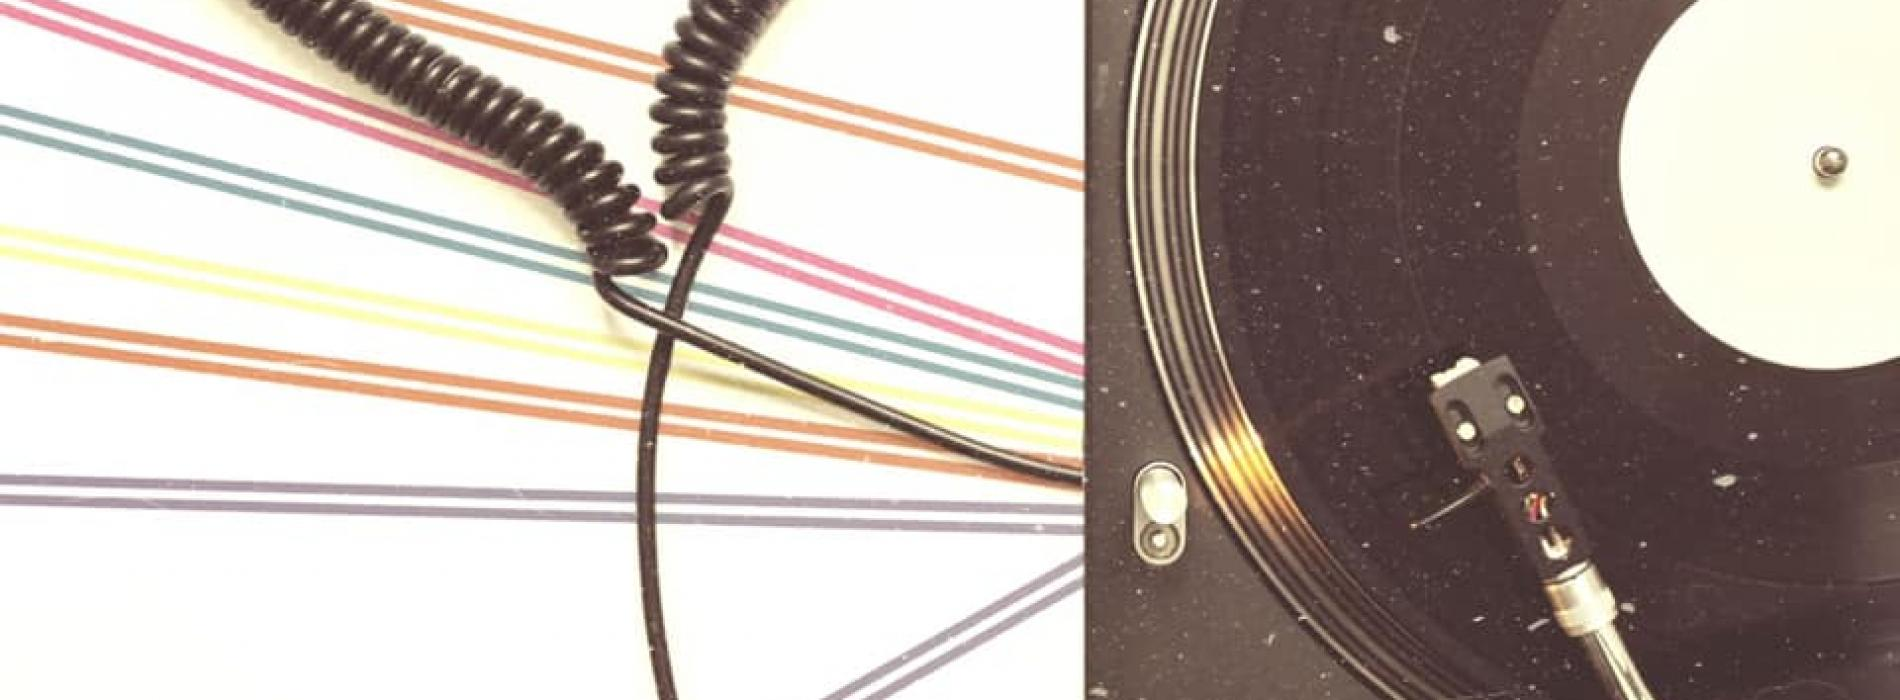 PULLÉ – Heart On The Line Ft AK (Official Audio)